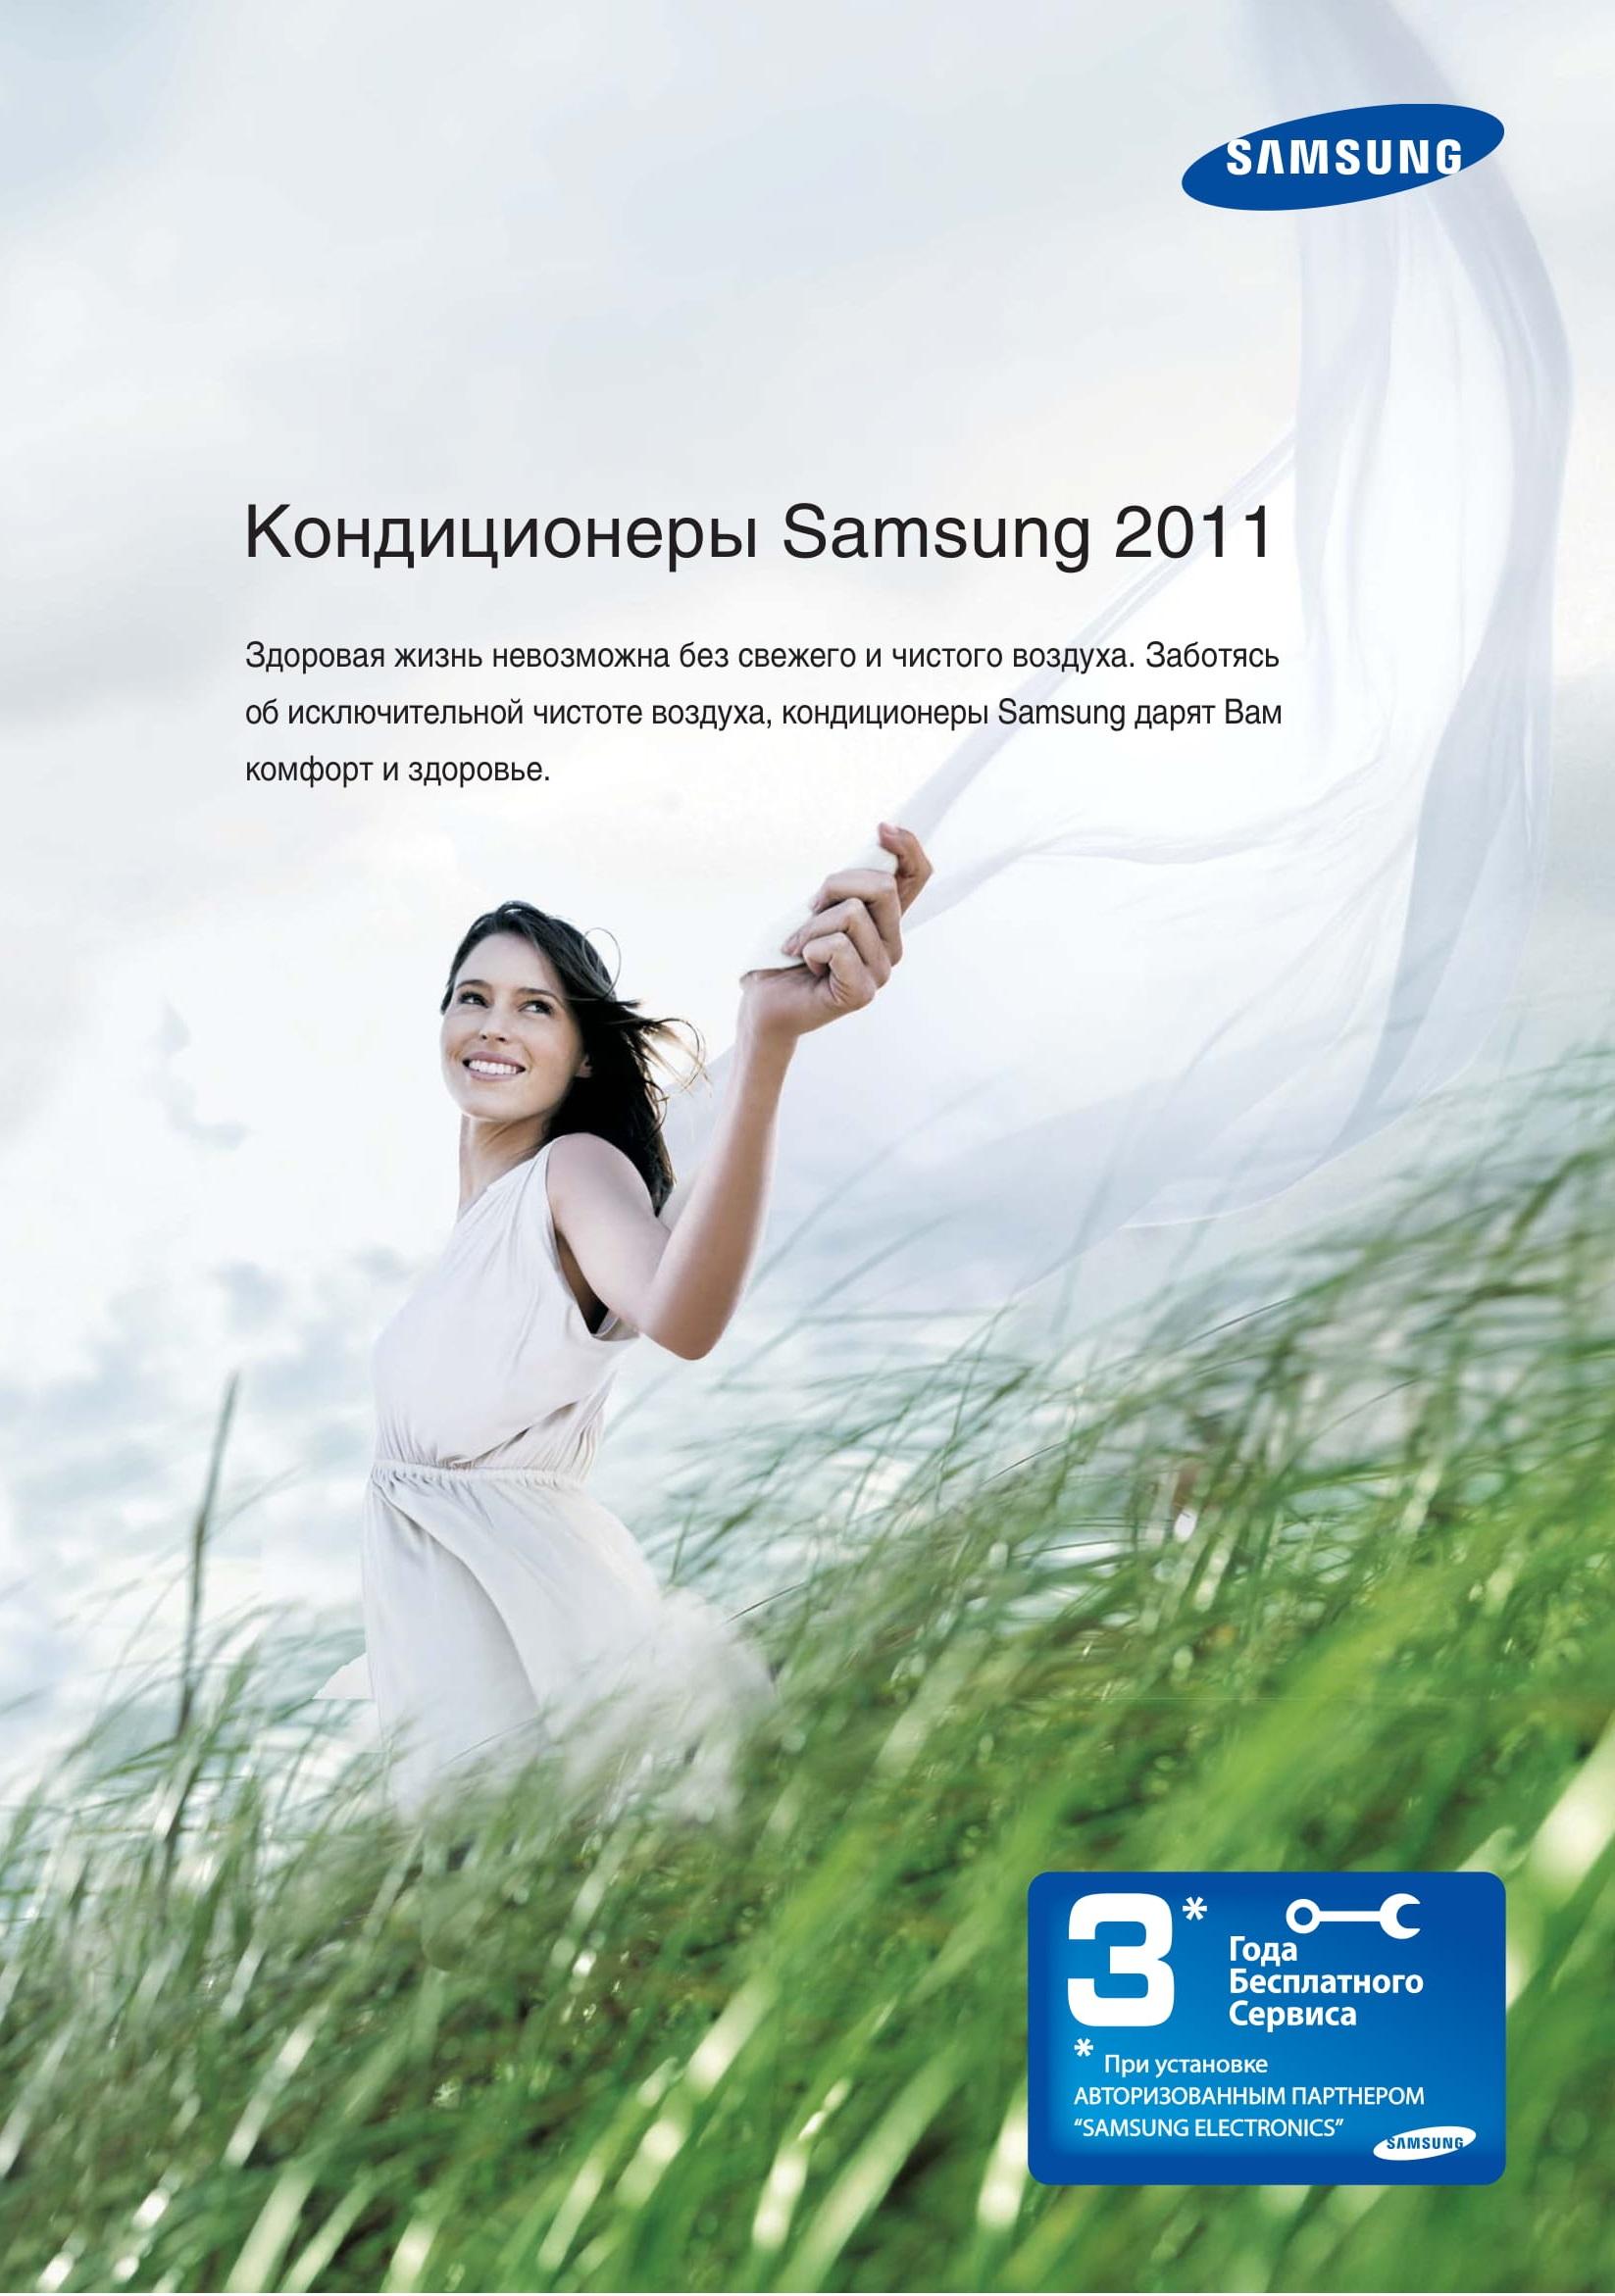 каталог Samsung 2011